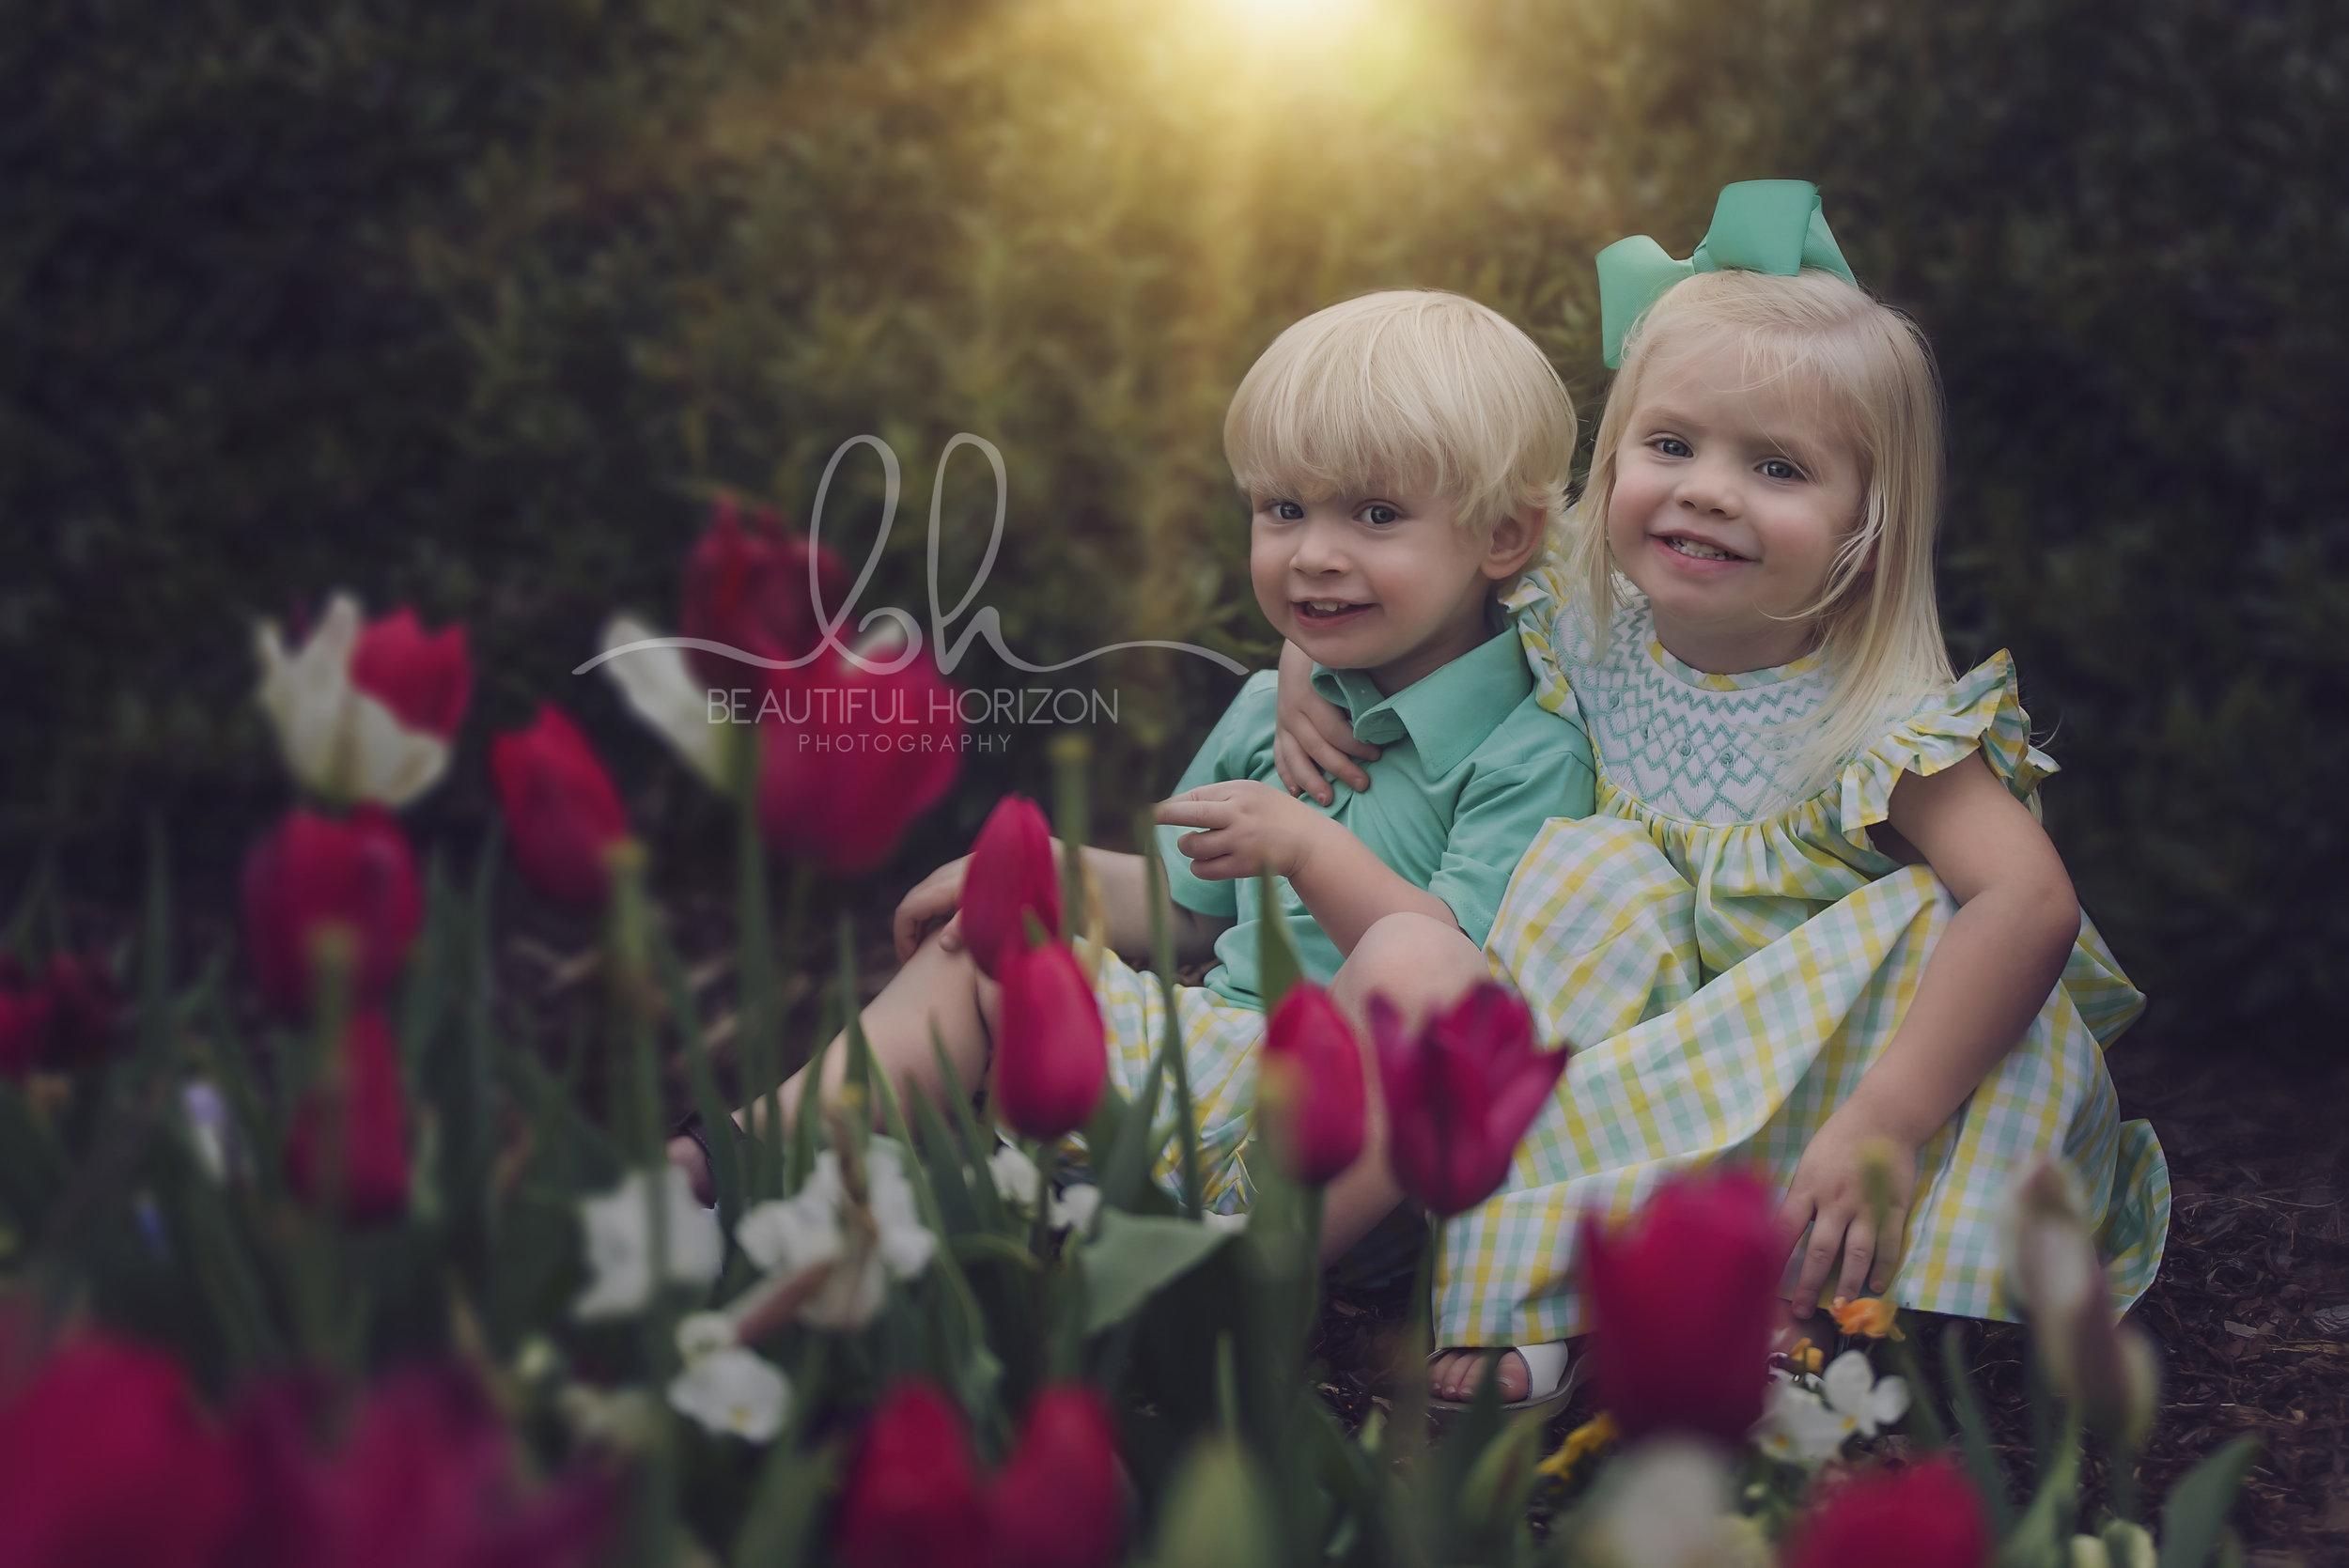 © Beautiful Horizon Photography . Tuscaloosa Portrait Photographer. Family Portraits. Tuscaloosa, Birmingham, Alabama Portrait Photographer.